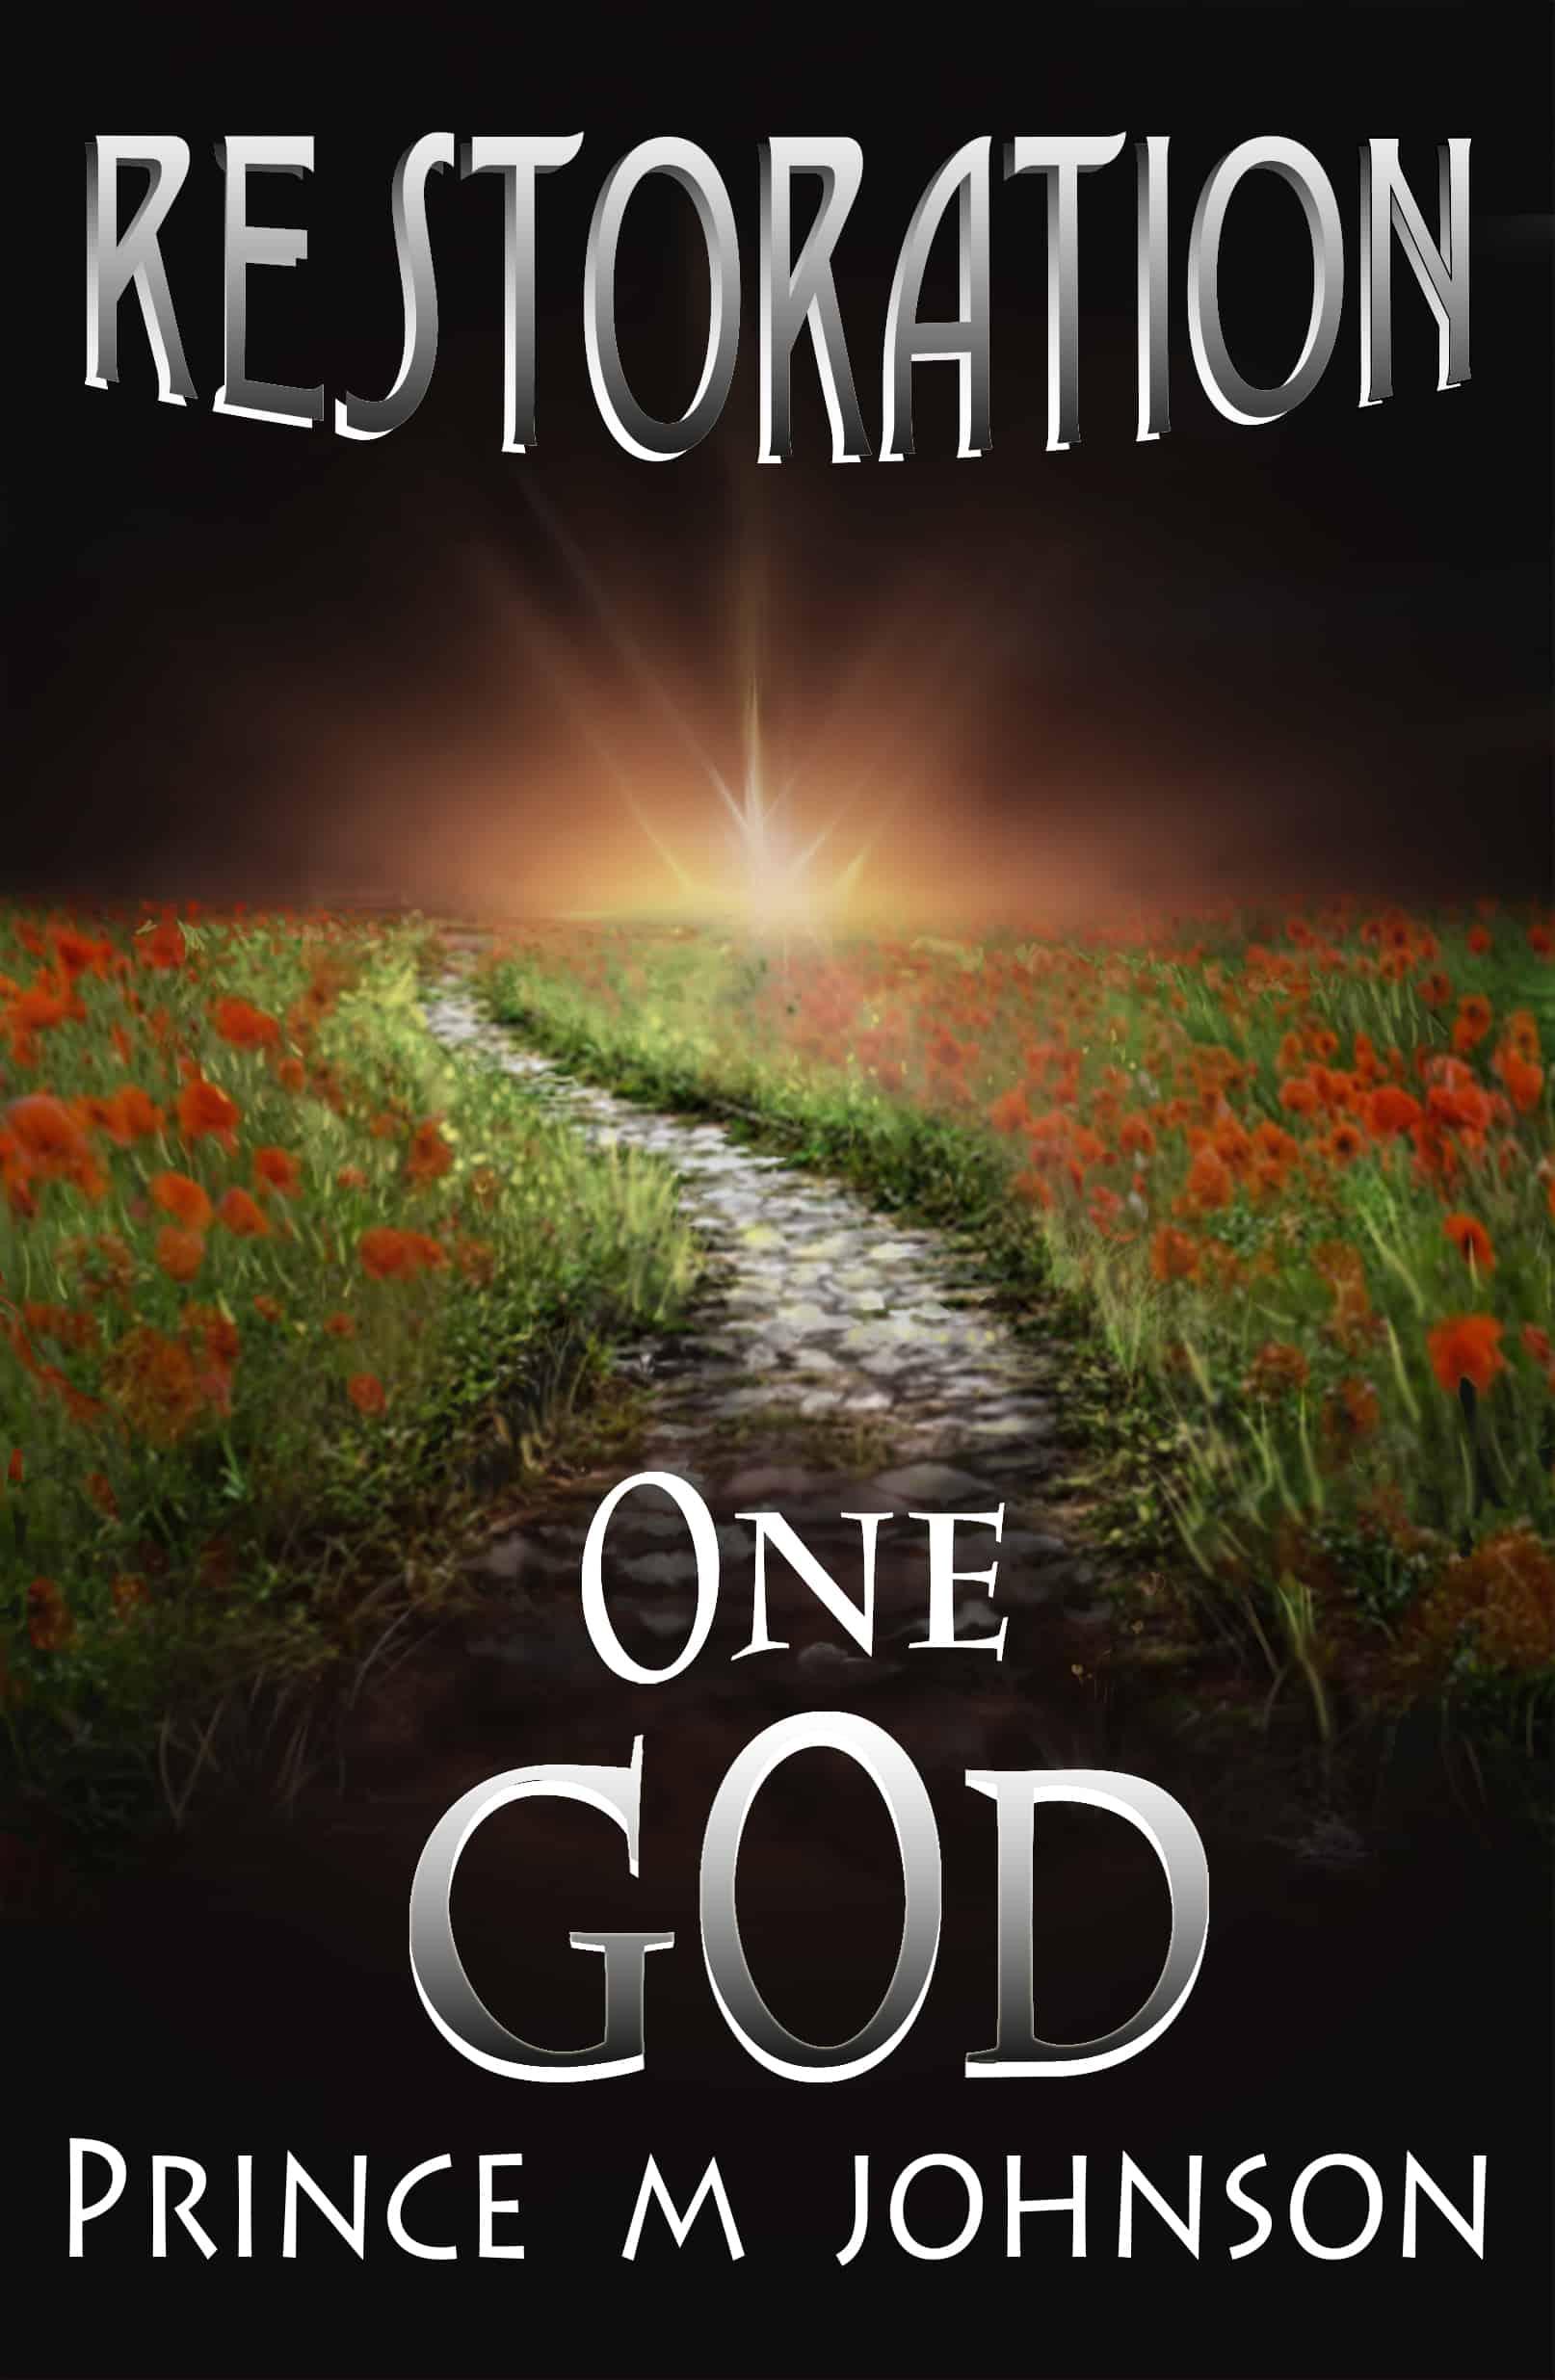 Restoration One God